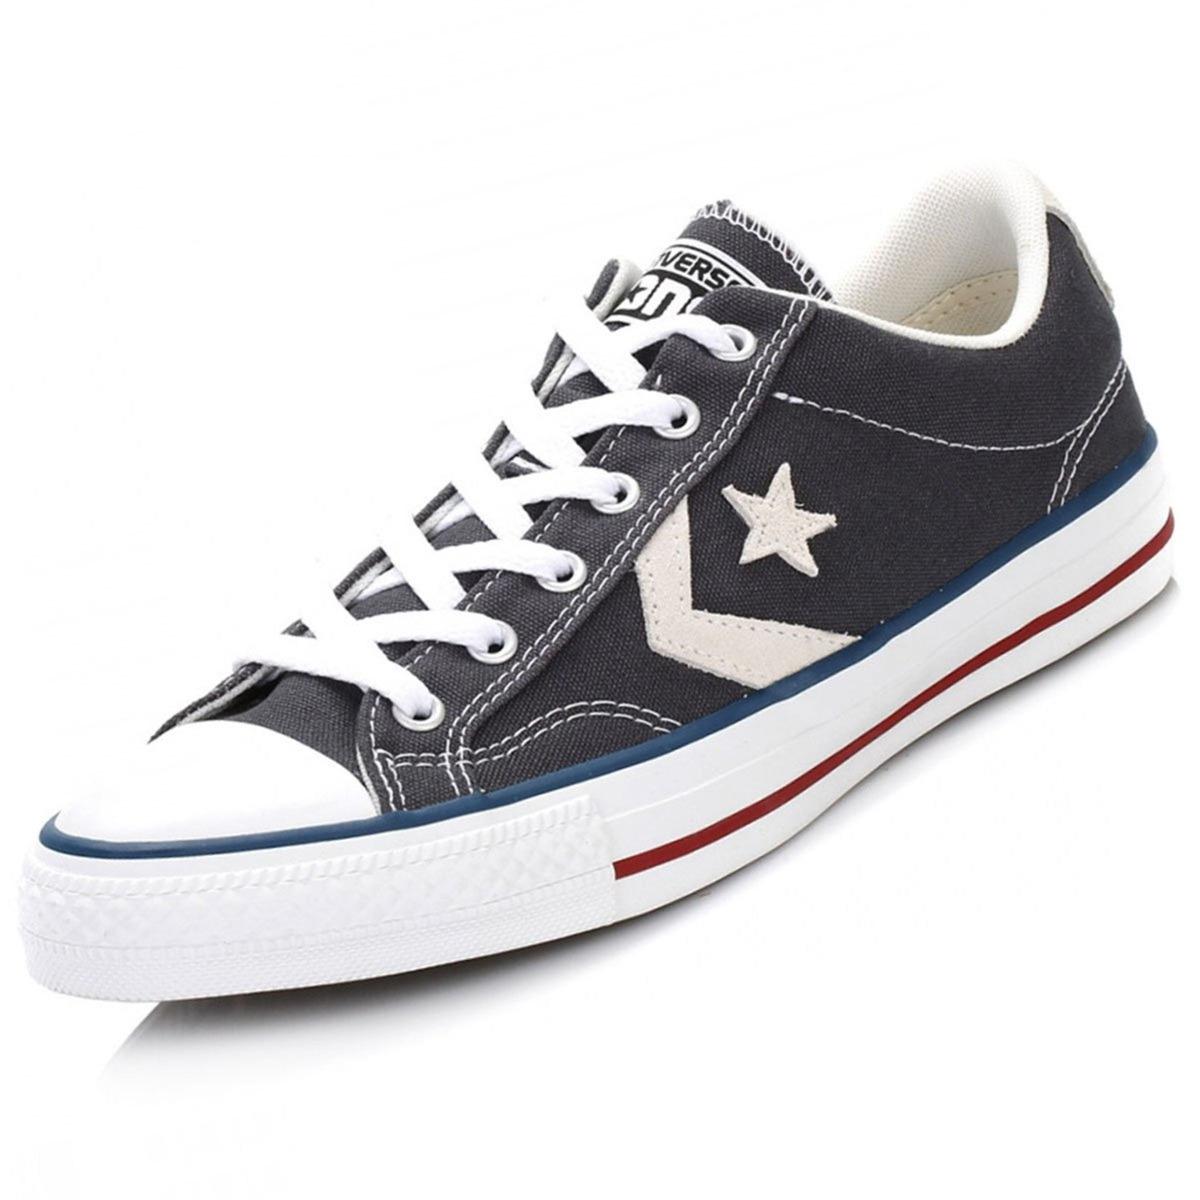 9a3859e51c0f zapatilla converse star player para hombre - plomo y azul. Cargando zoom.